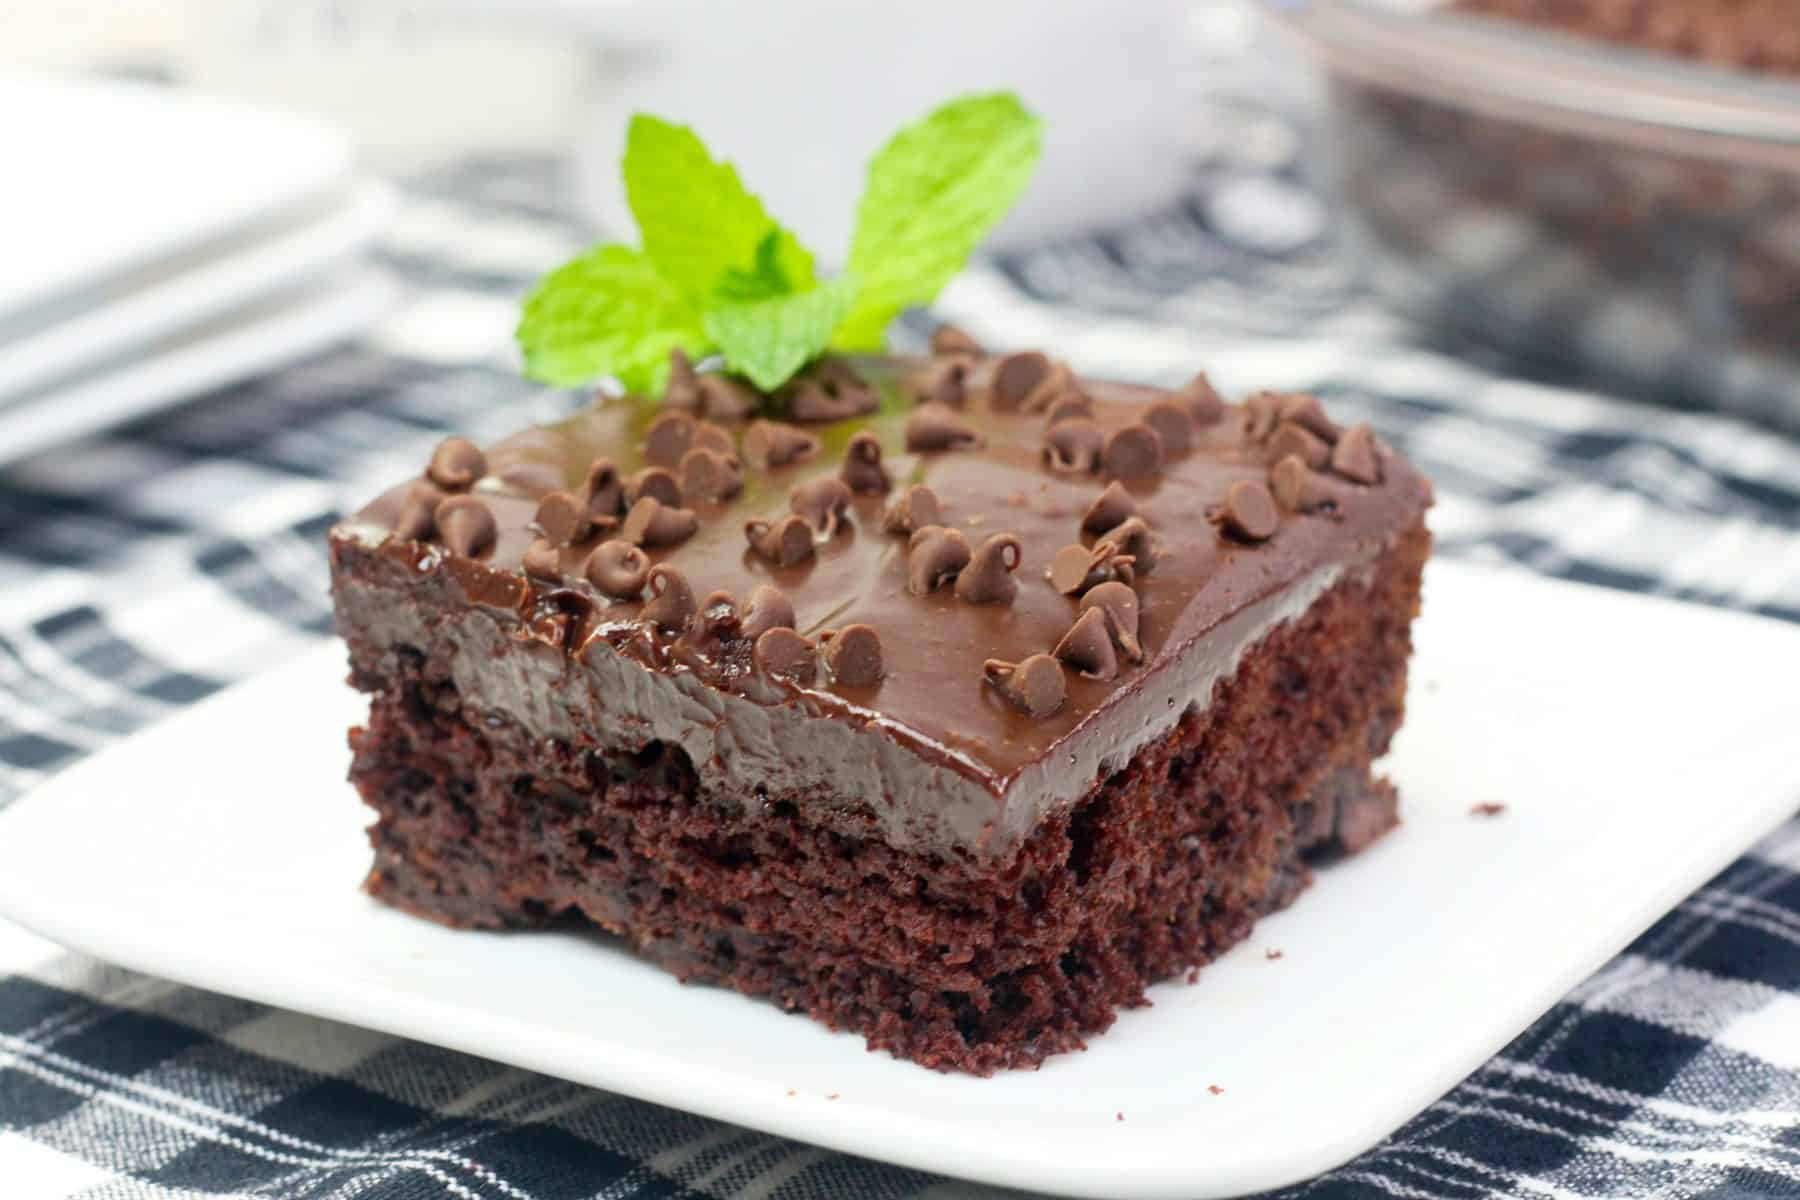 Chocolate Mint Cake, Mint Texas Trash Cake Recipe